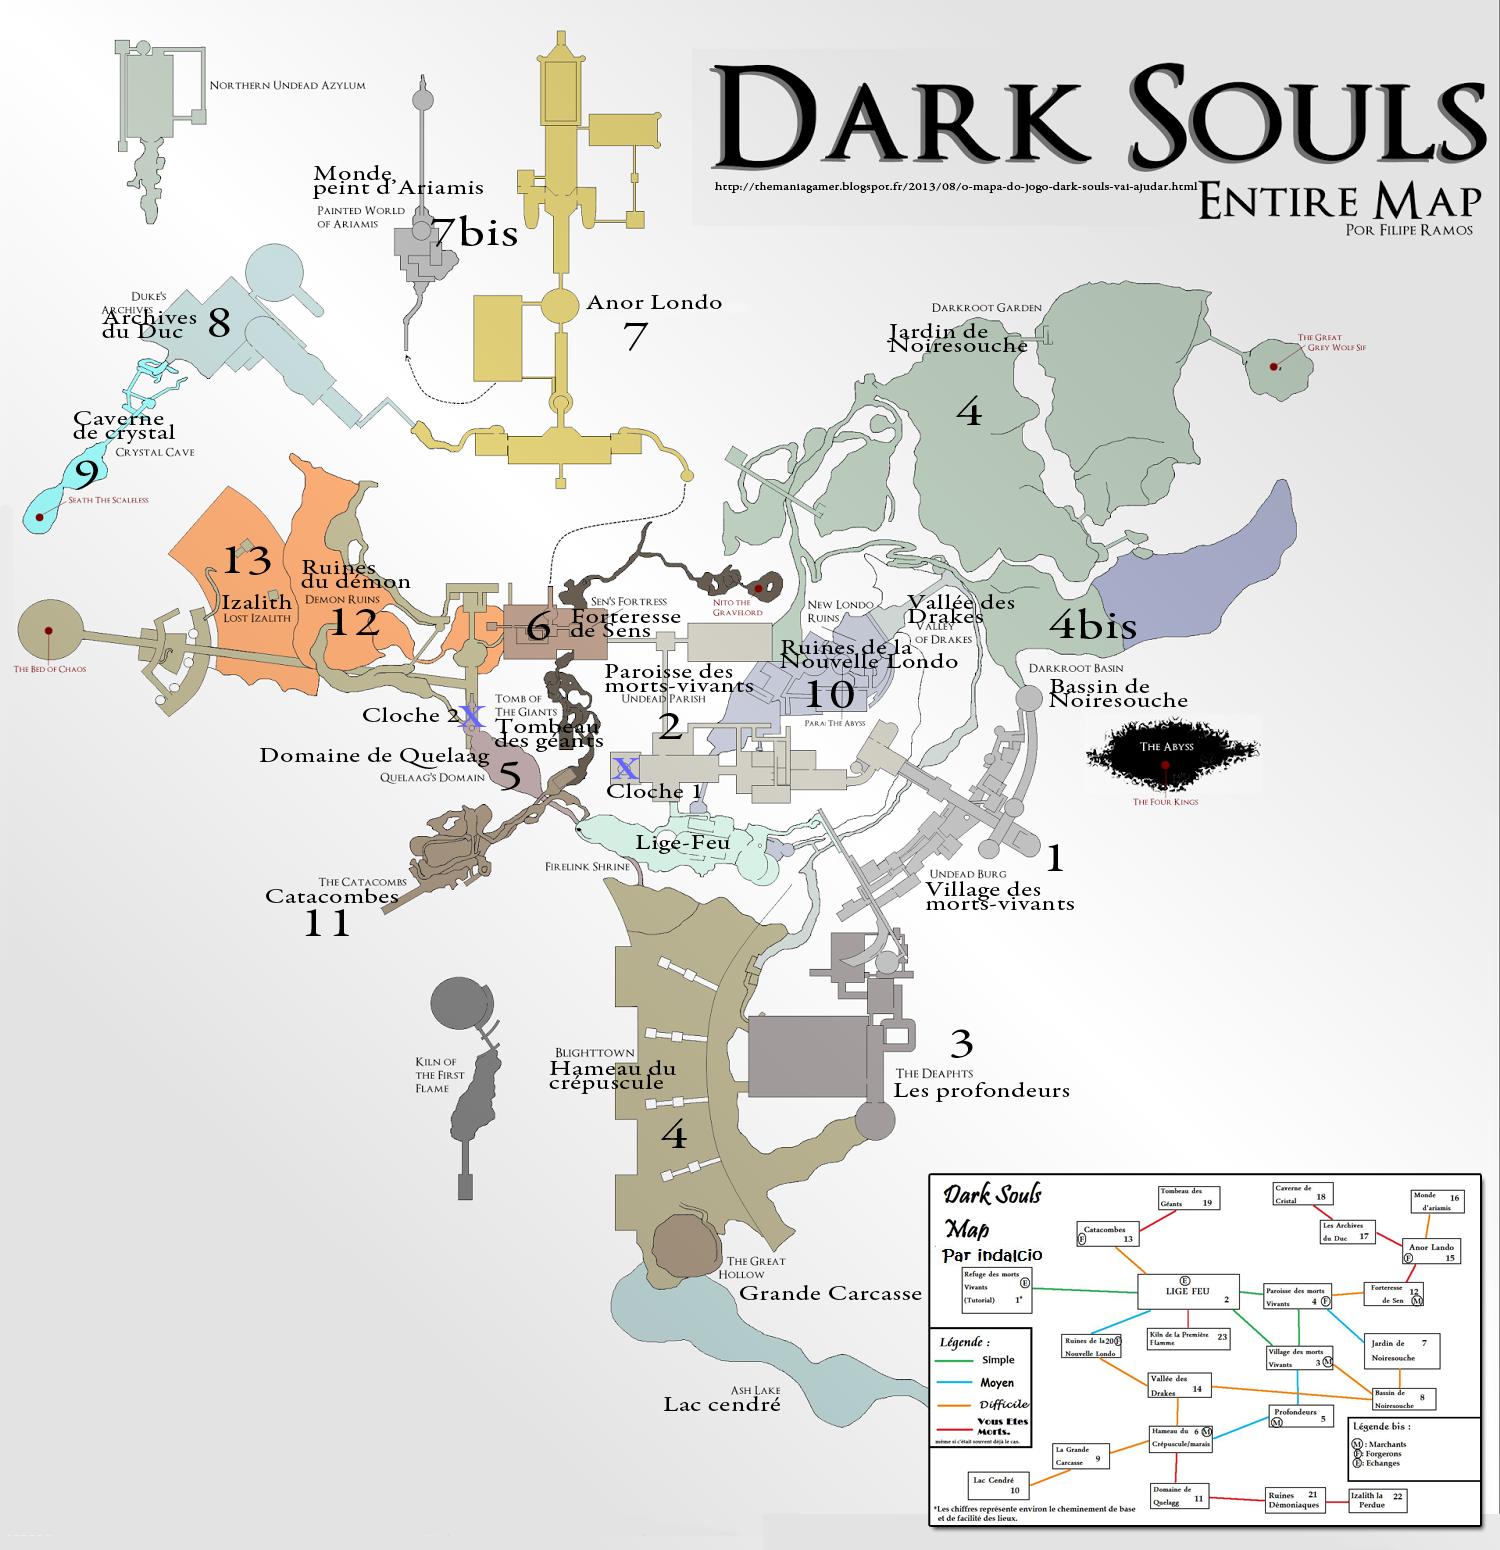 Darksouls Map somalia on map realtor.com maps